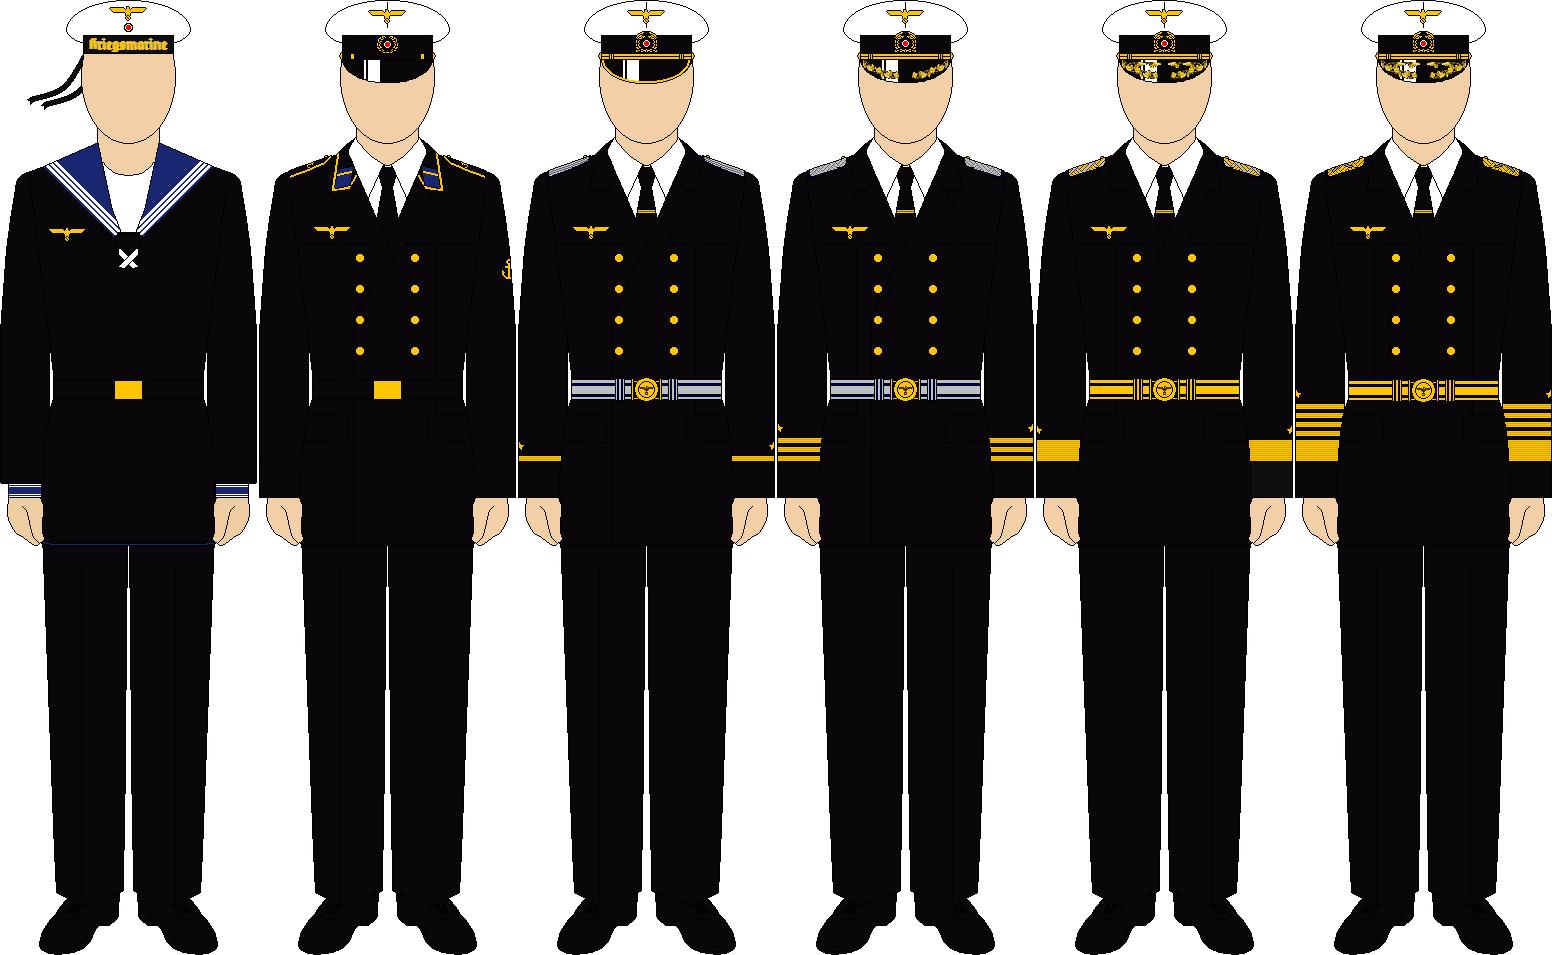 Kriegsmarine winter parade dress by thefalconette-d5audqd.png